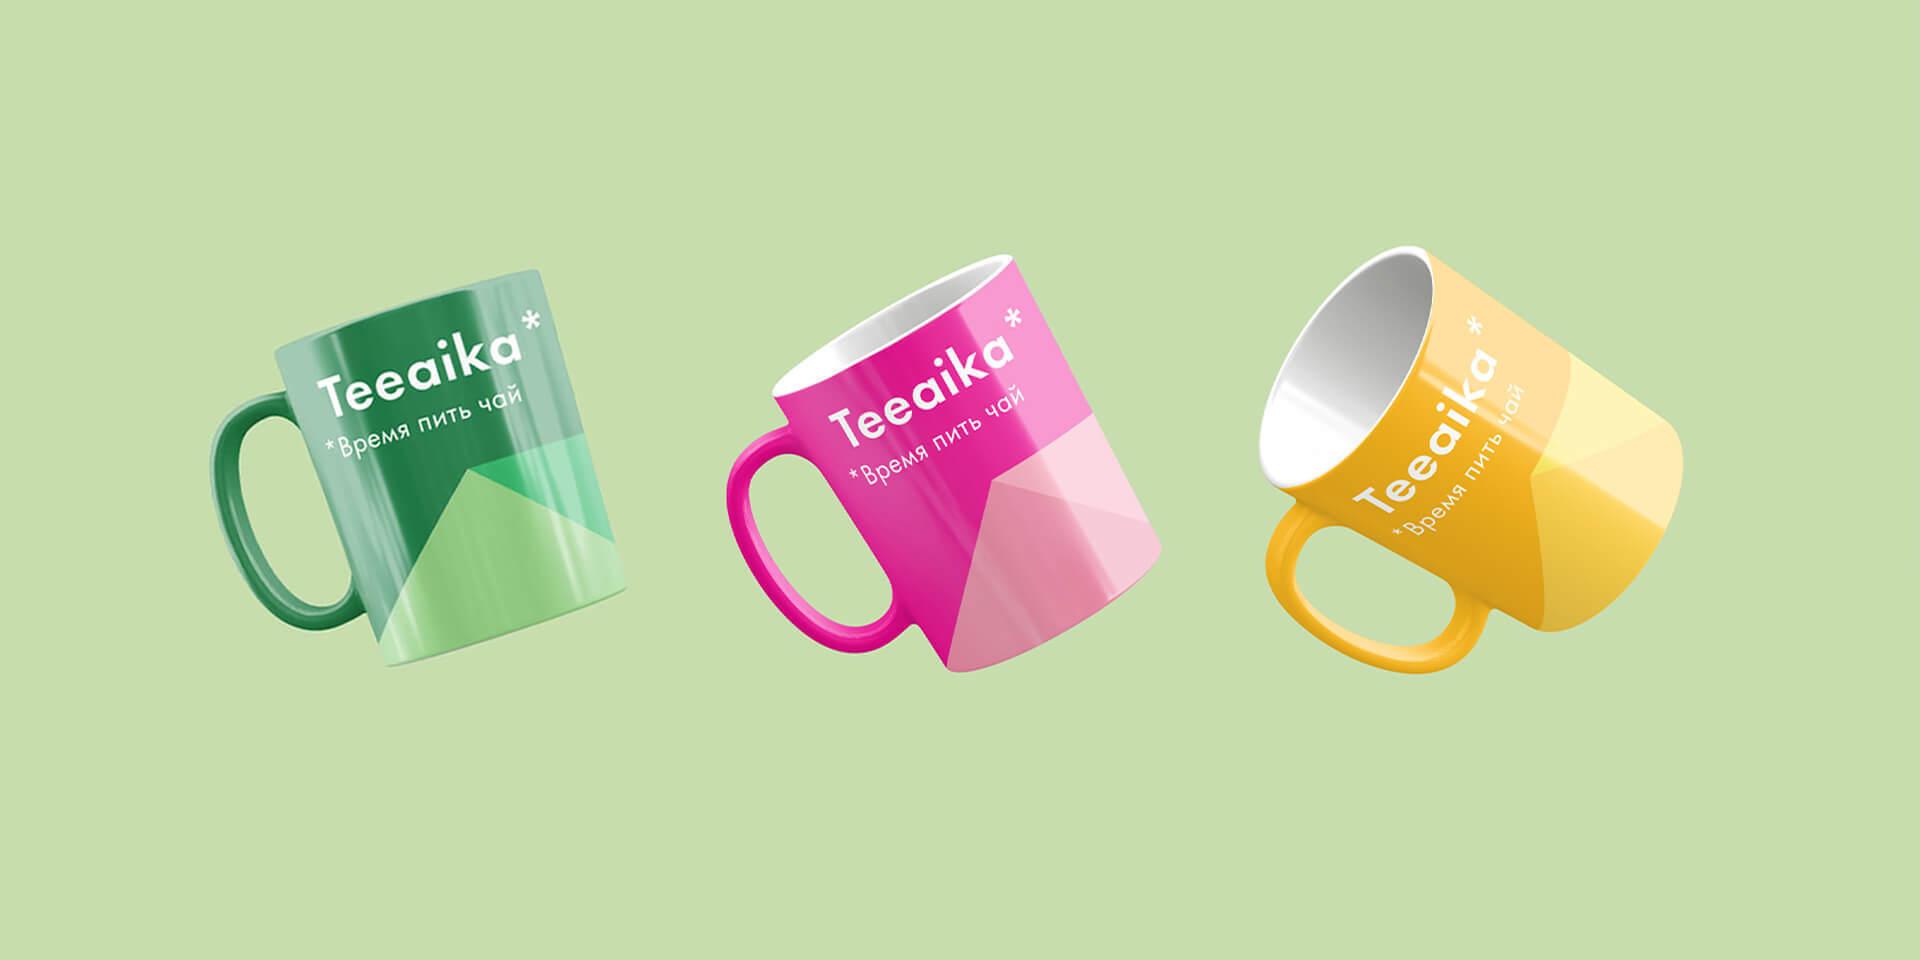 Lovemedo Branding Agency Design Brand Book of Prisma the Finnish Supermarkets